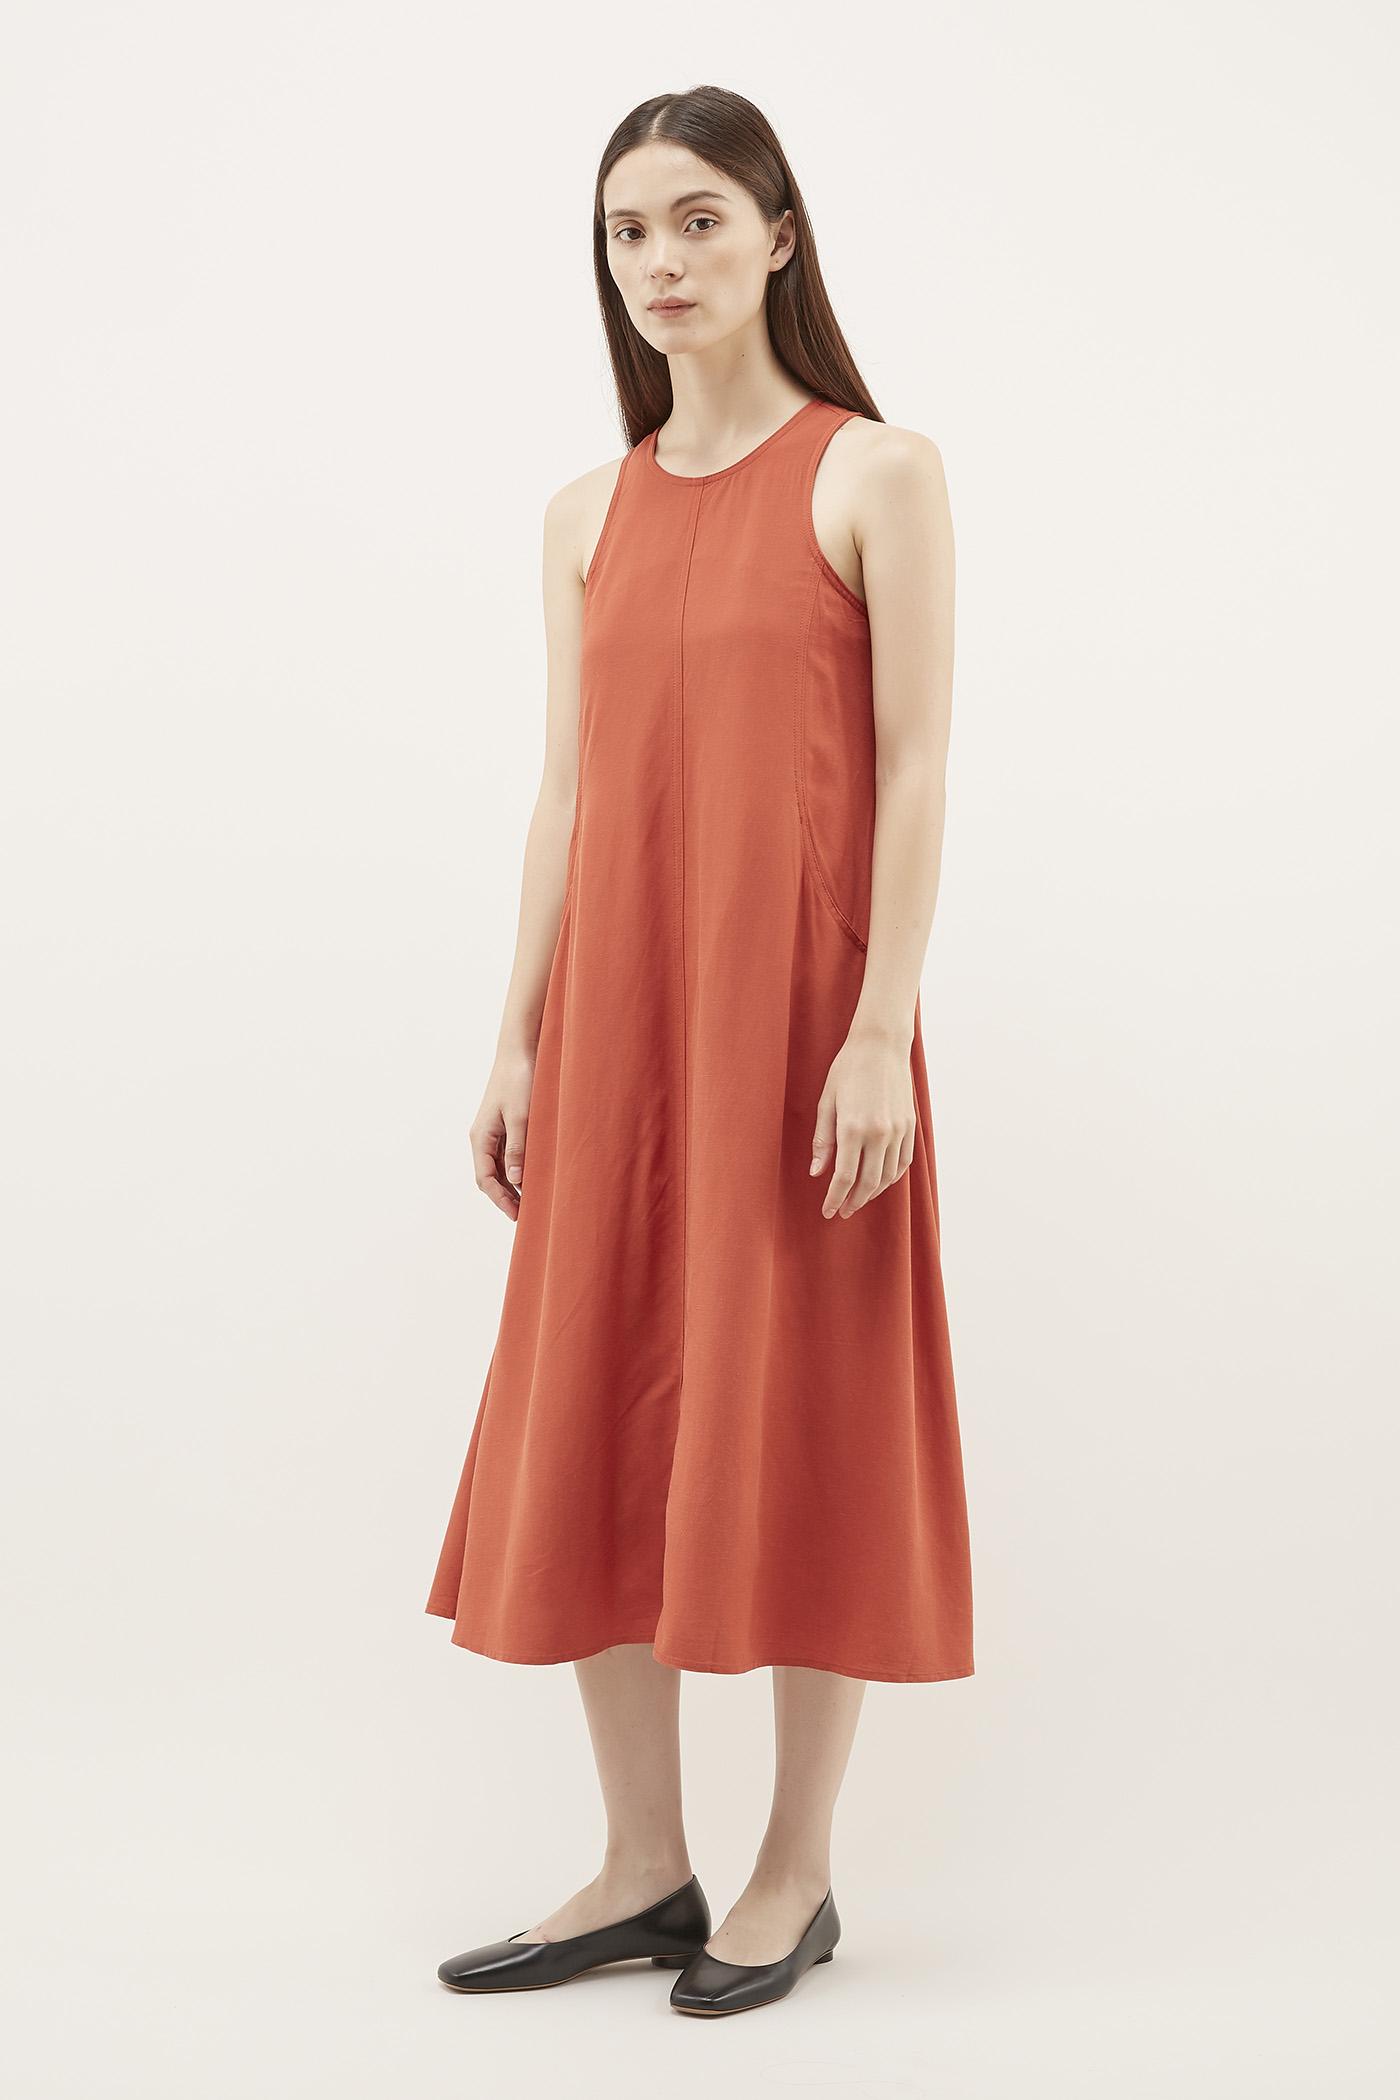 Amara Swing Dress